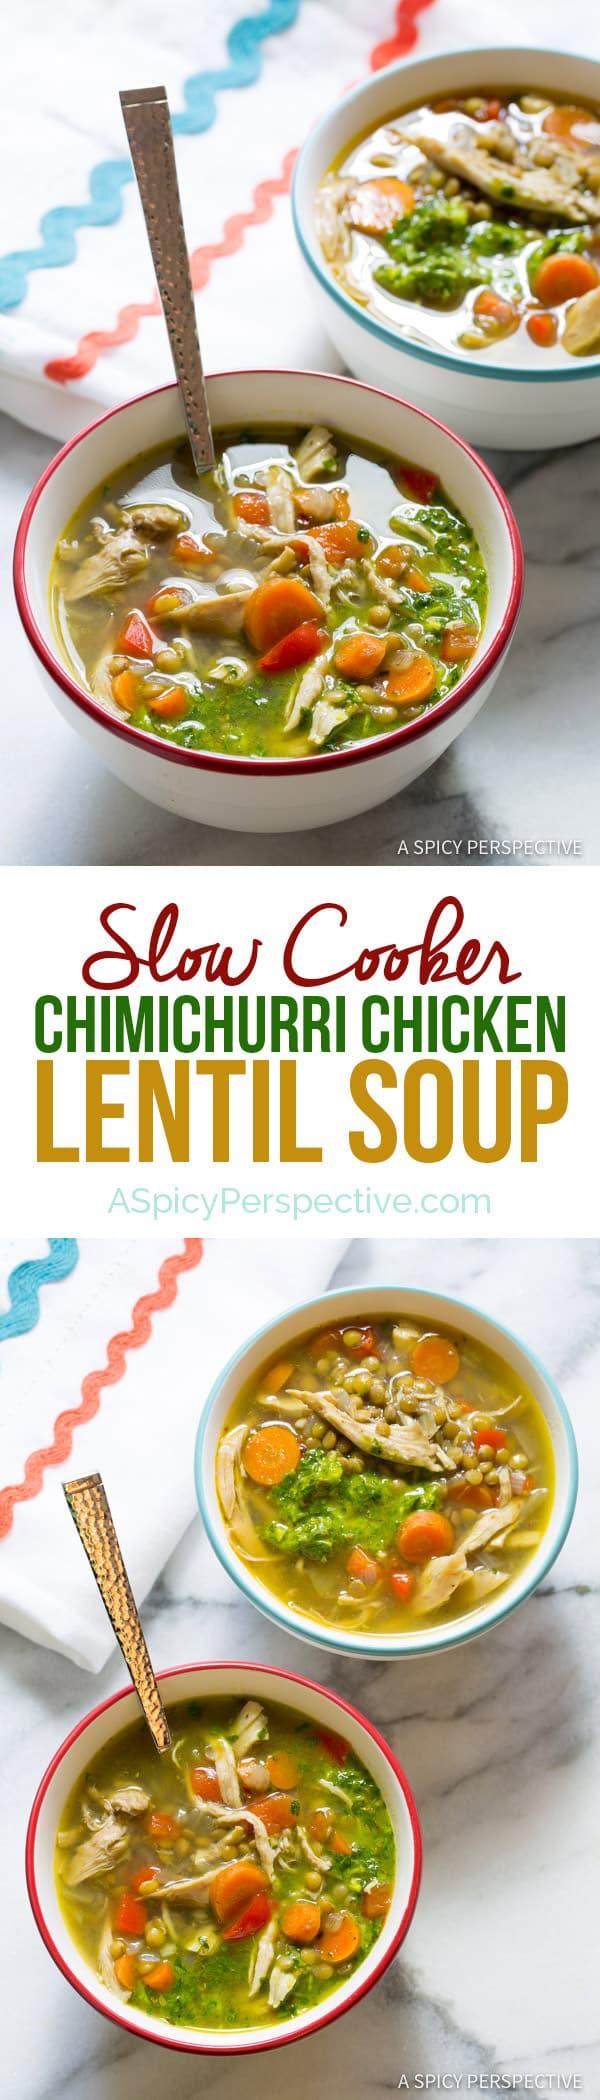 Healthy Slow Cooker Chimichurri Chicken Lentil Soup | ASpicyPerspective.com